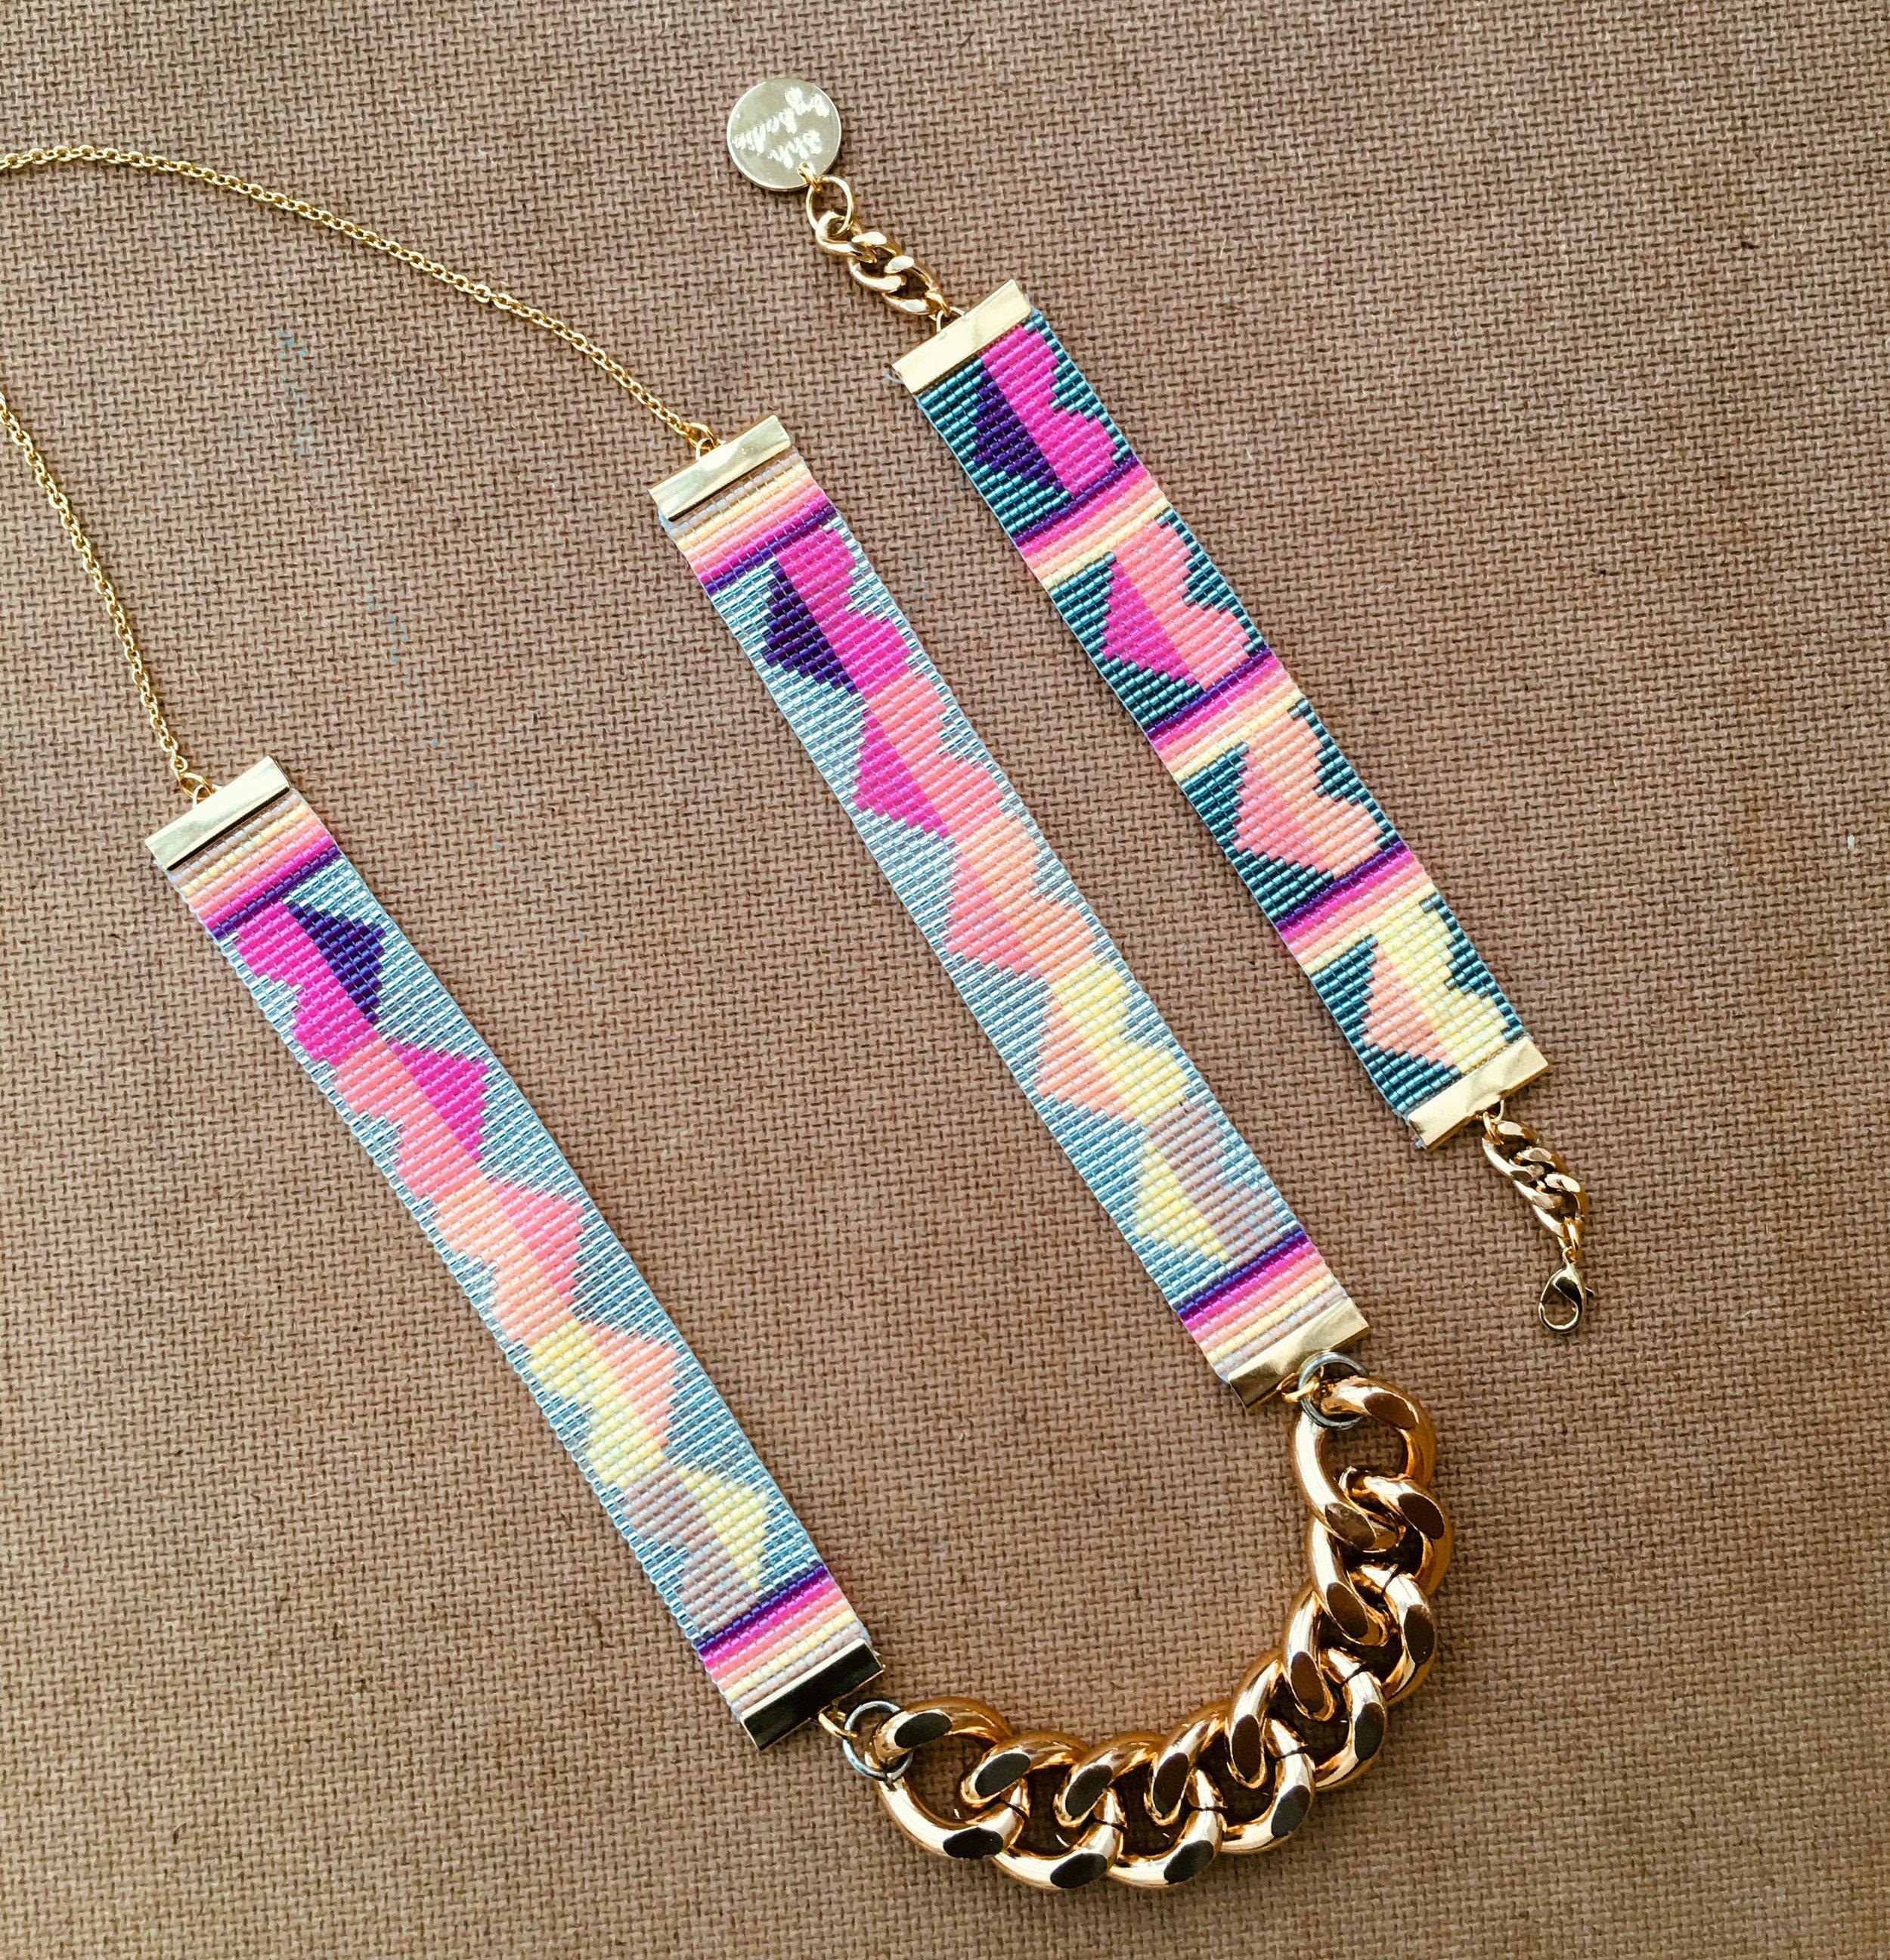 Moira necklace + Bracelet.jpg